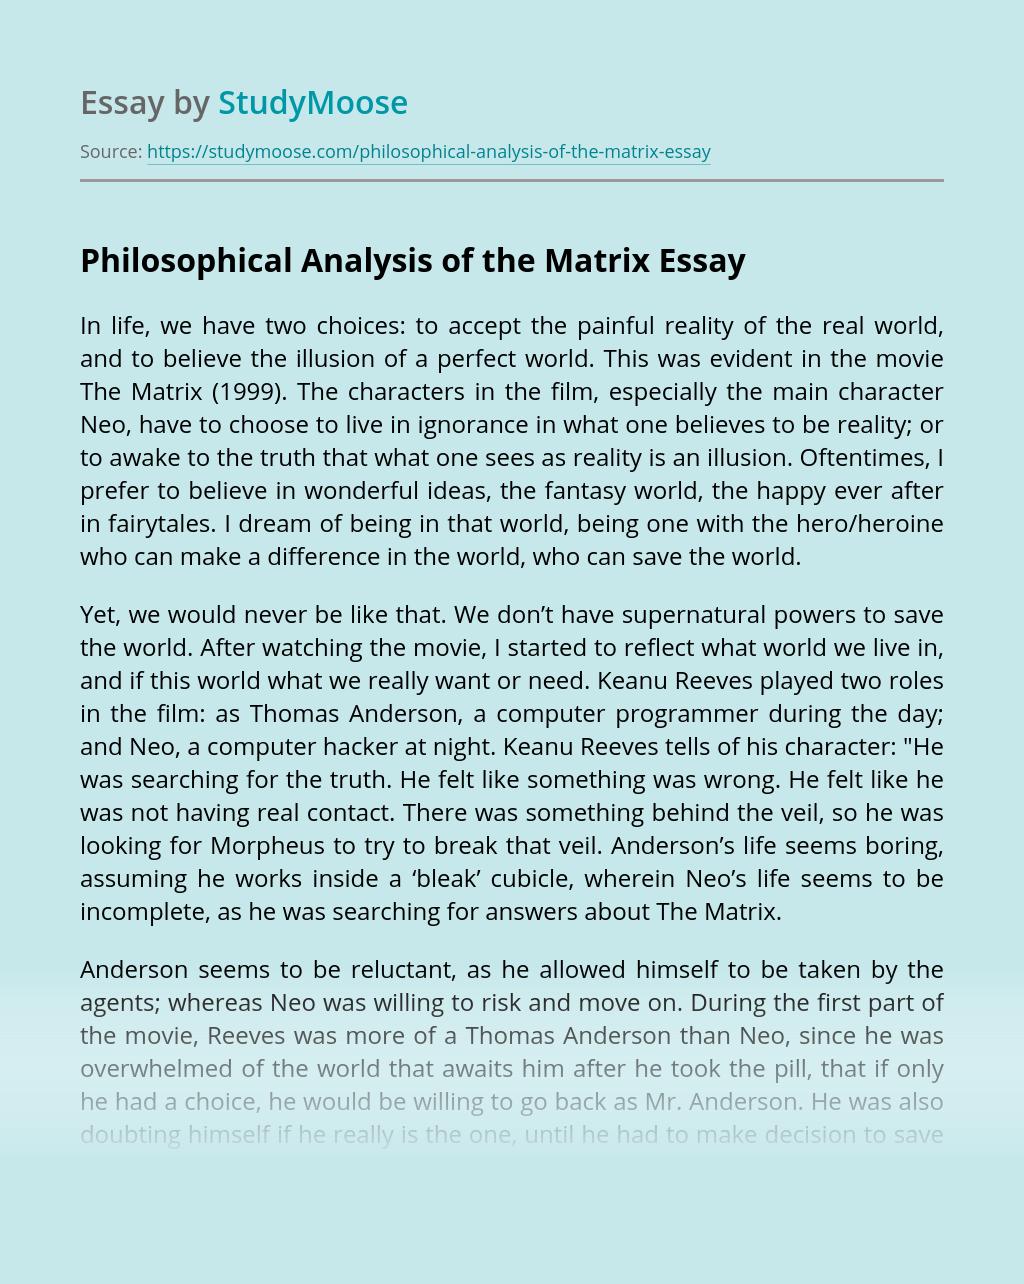 Philosophical Analysis of the Matrix